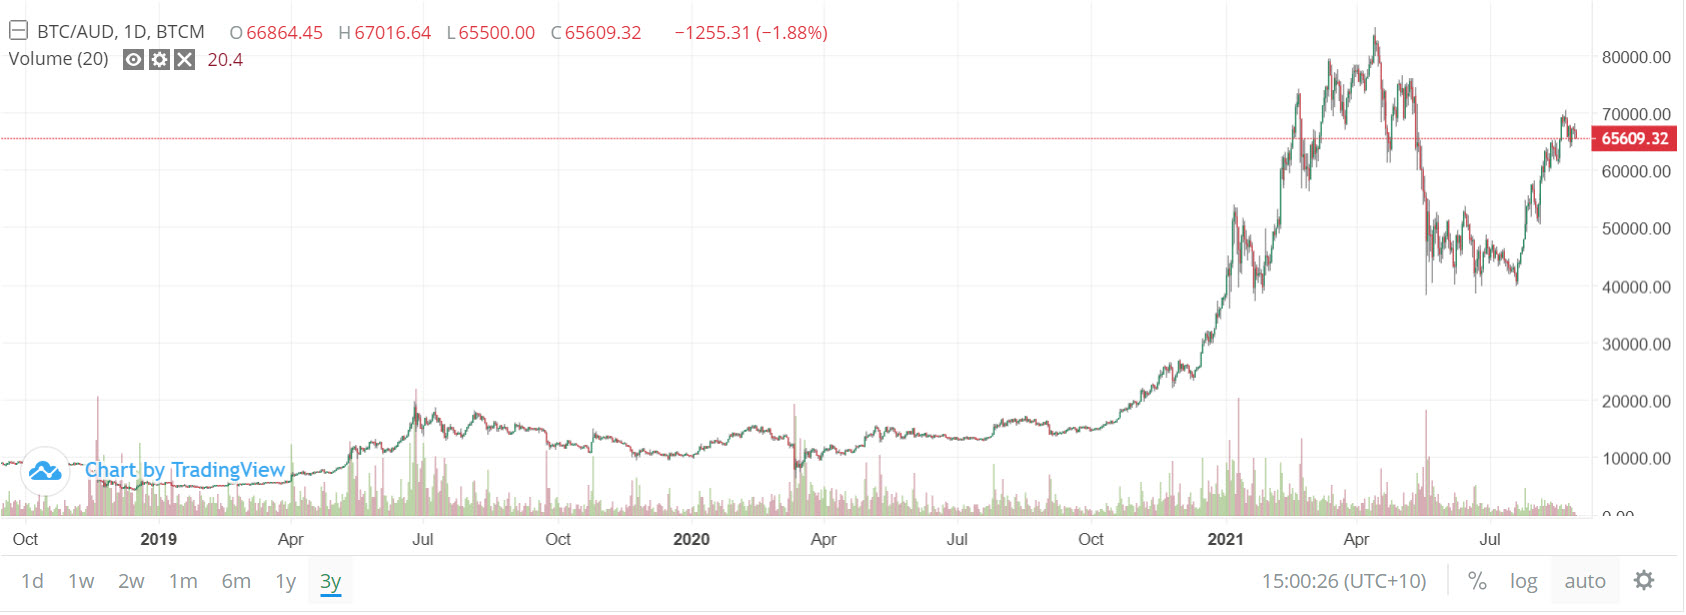 3 year chart on Bitcoin | BTC Markets